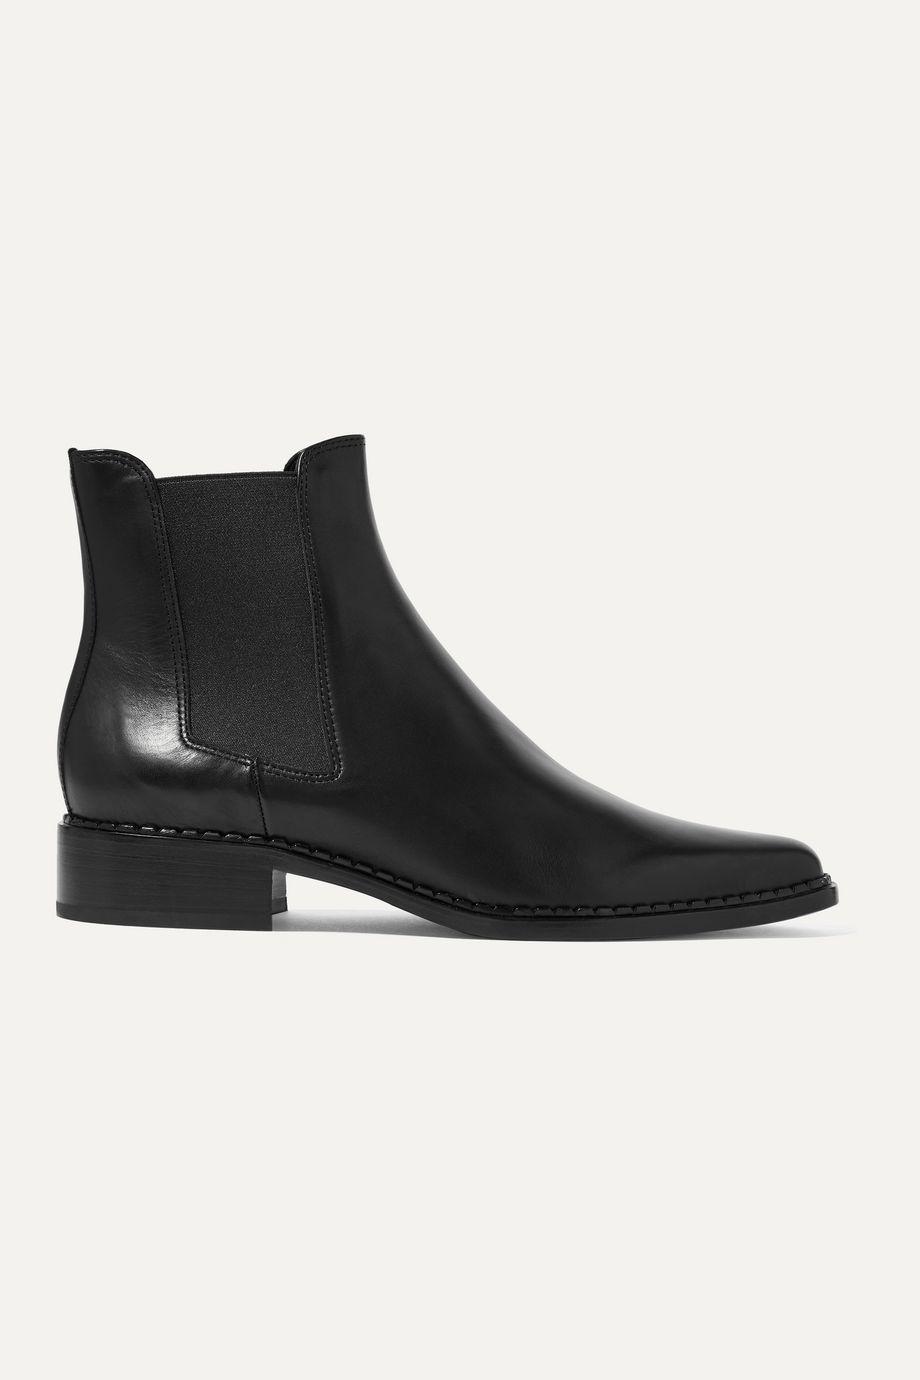 Vince Denver leather Chelsea boots